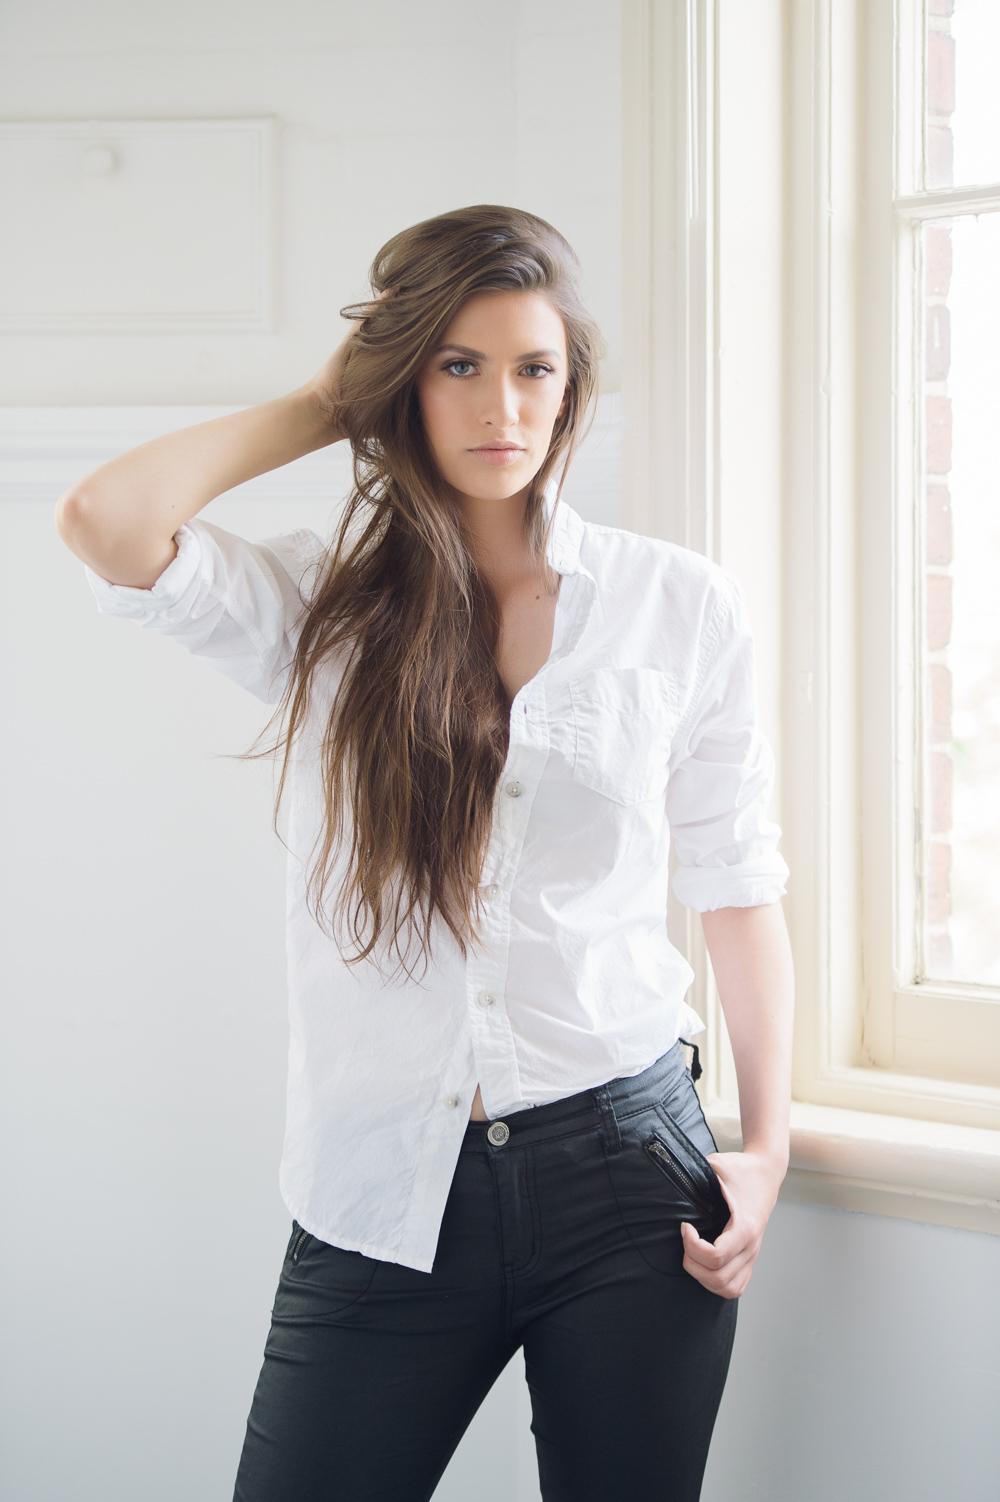 fashion-photography-model-portfolio